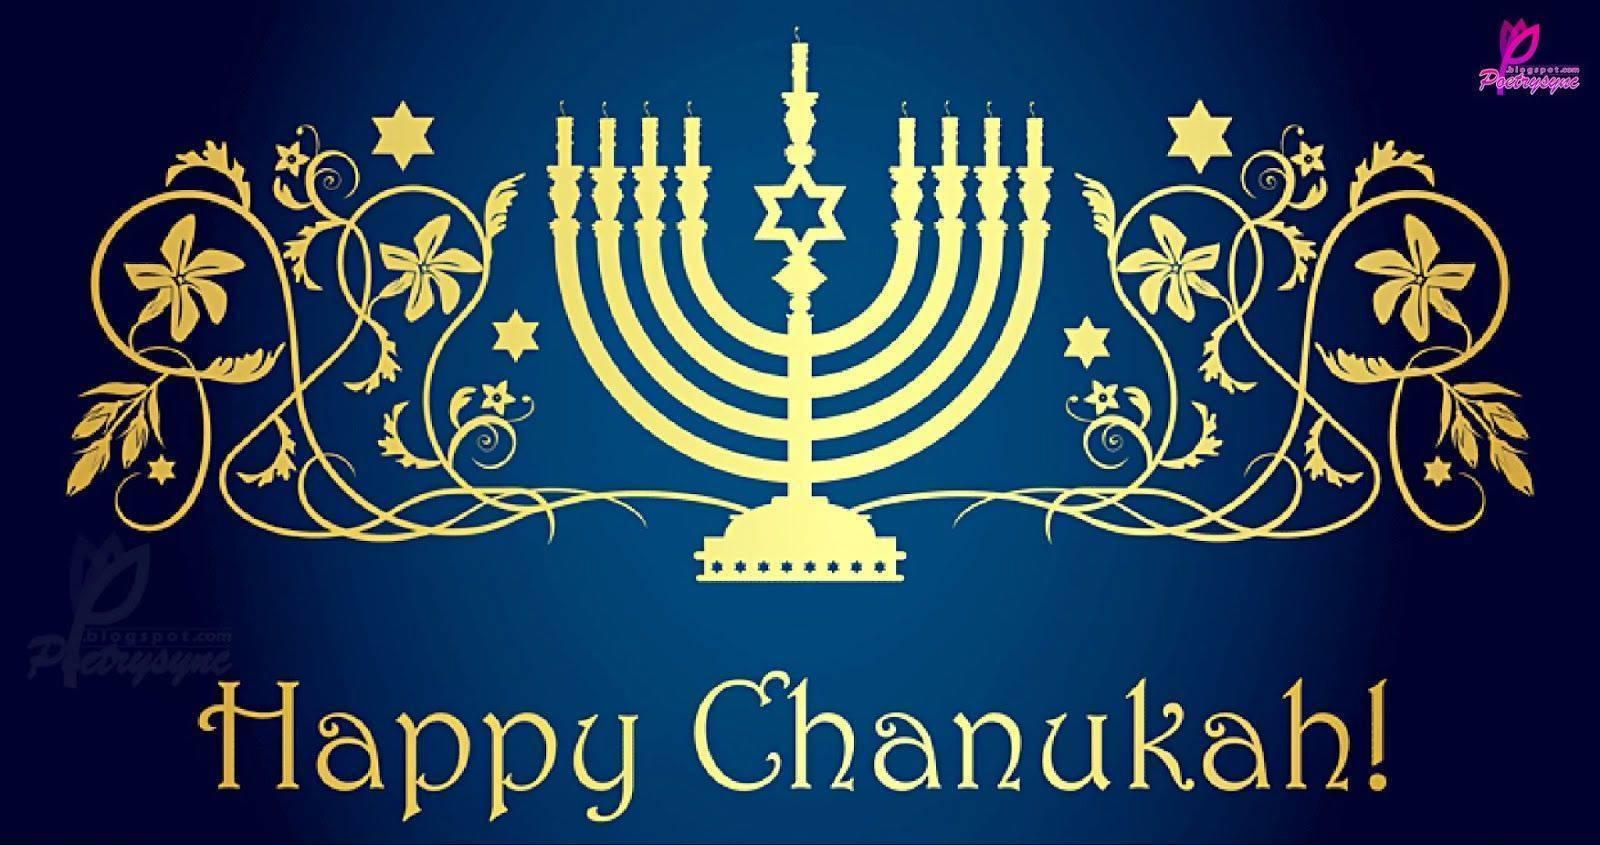 492b0996b00f9a47ef63_8fa20646c19608f9766d_219956-Happy-Hanukkah.jpg